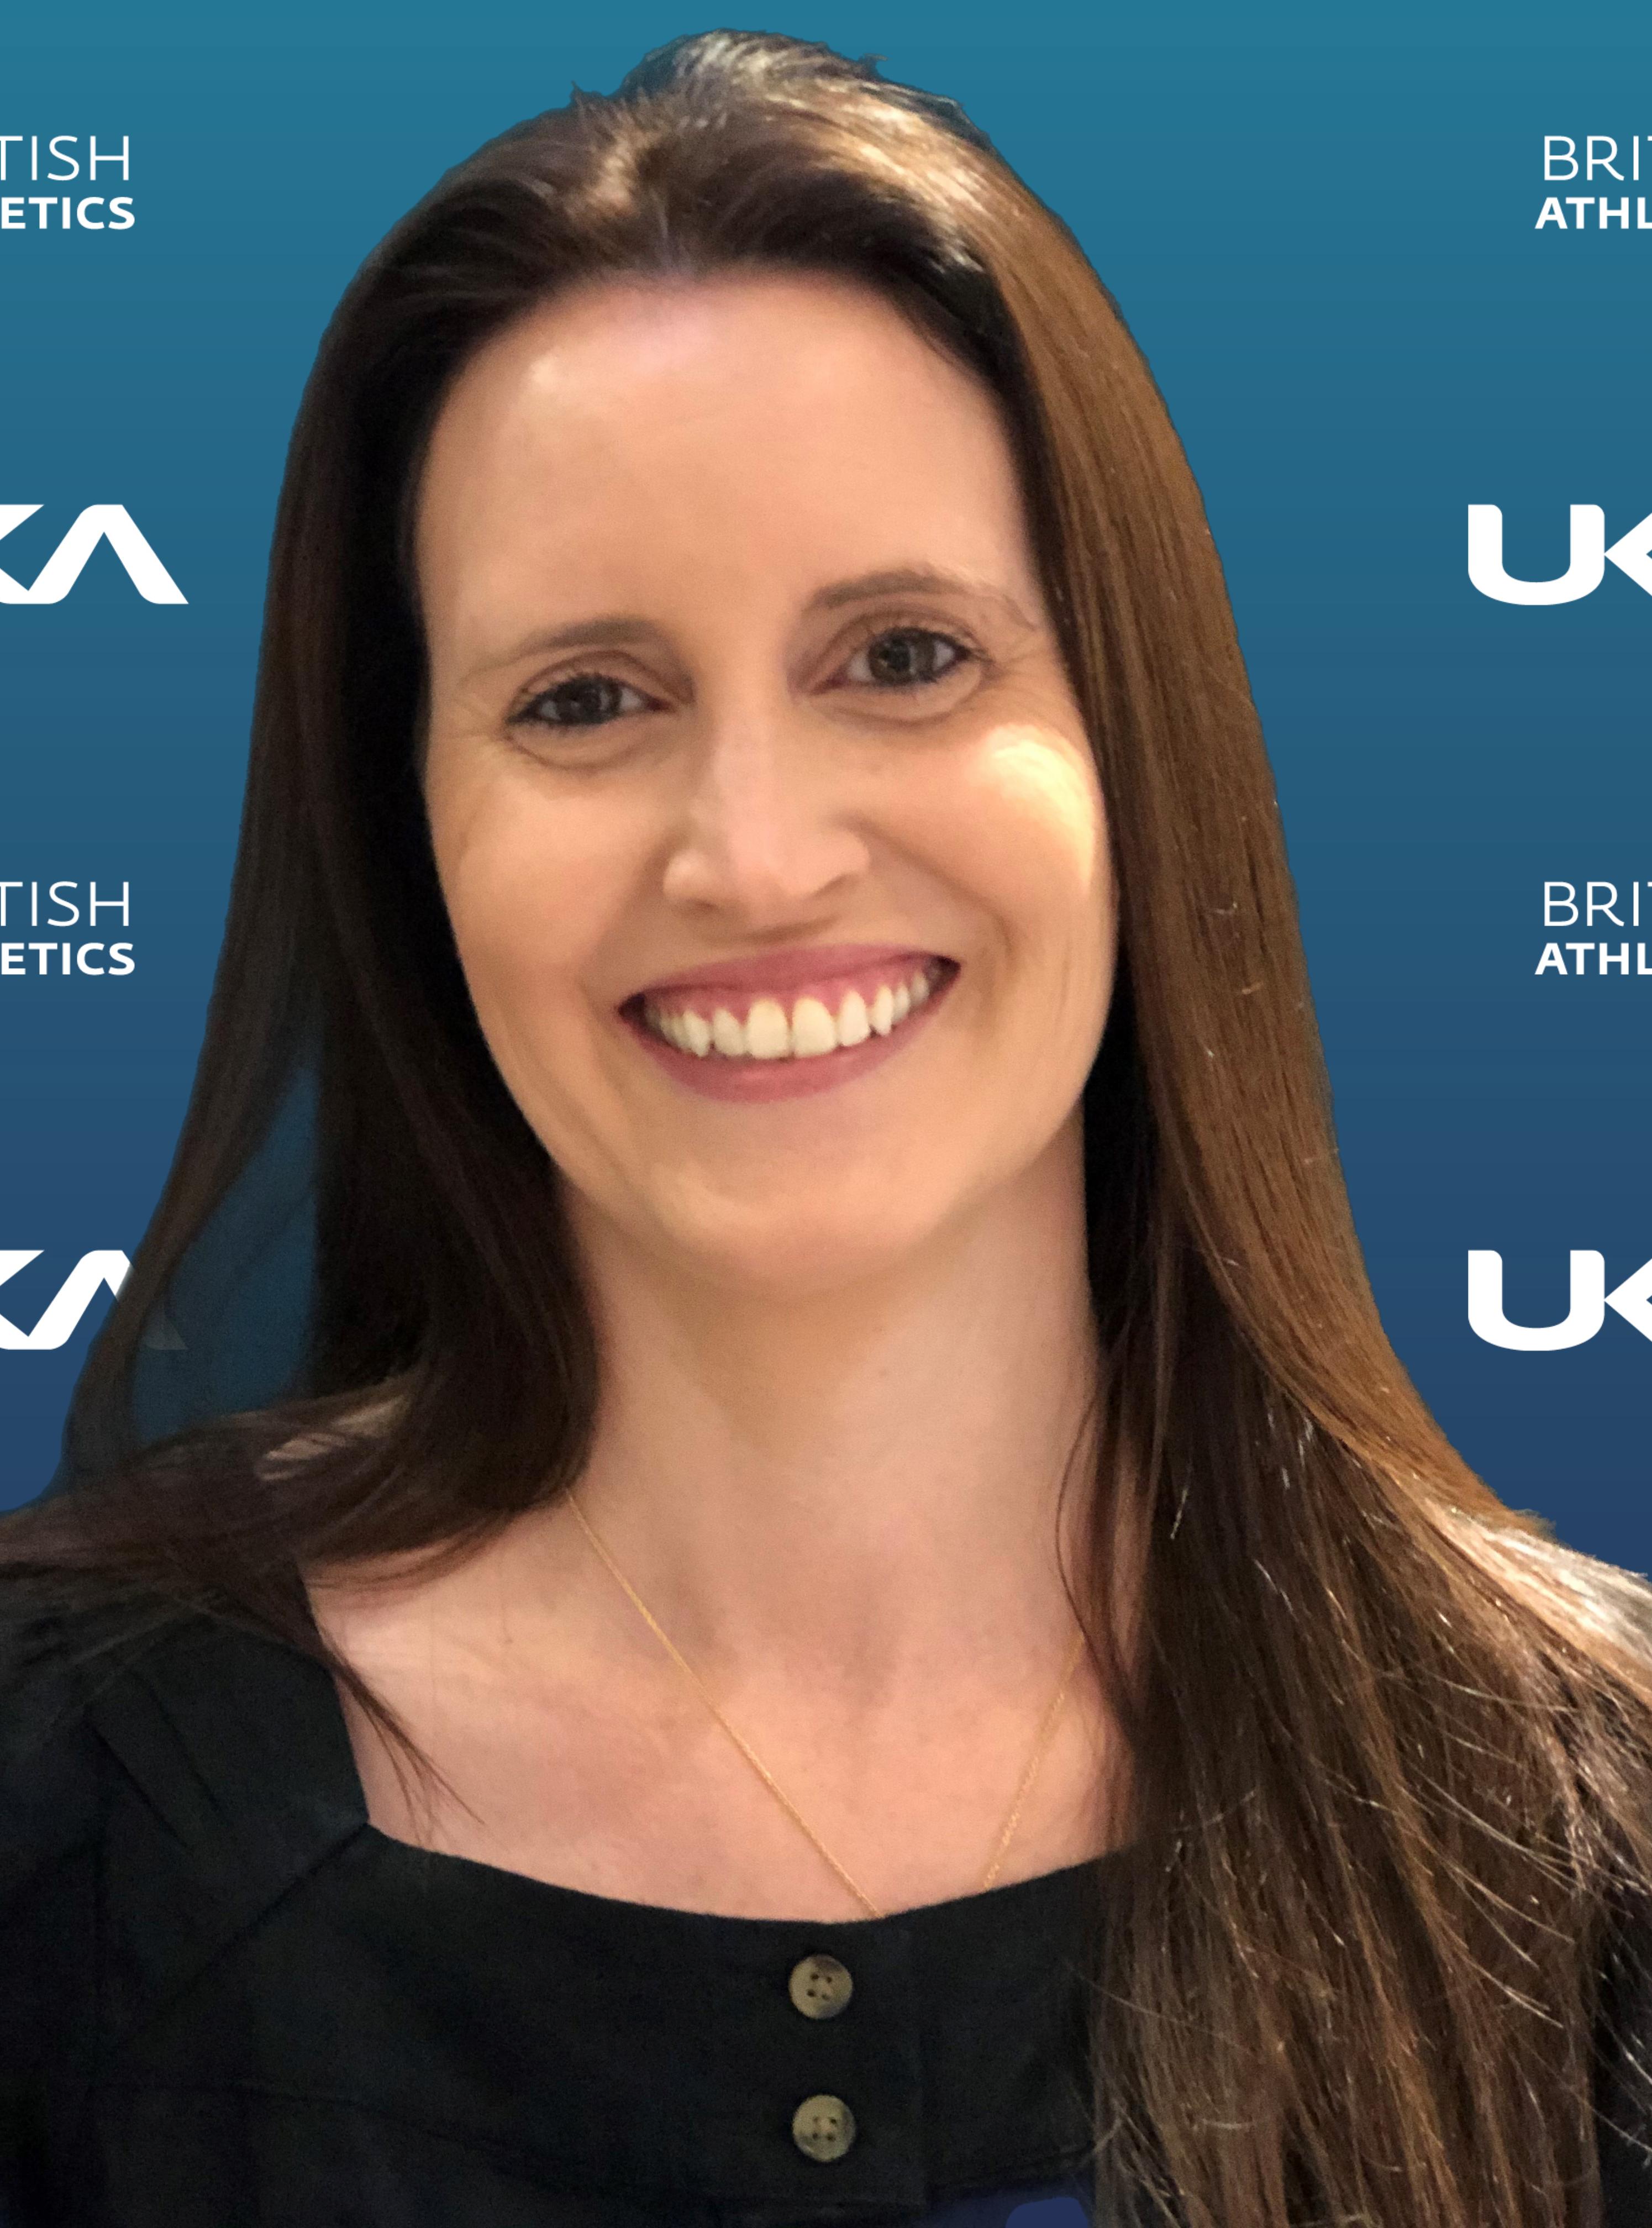 Rebecca Cudby, HR Officer, UKA